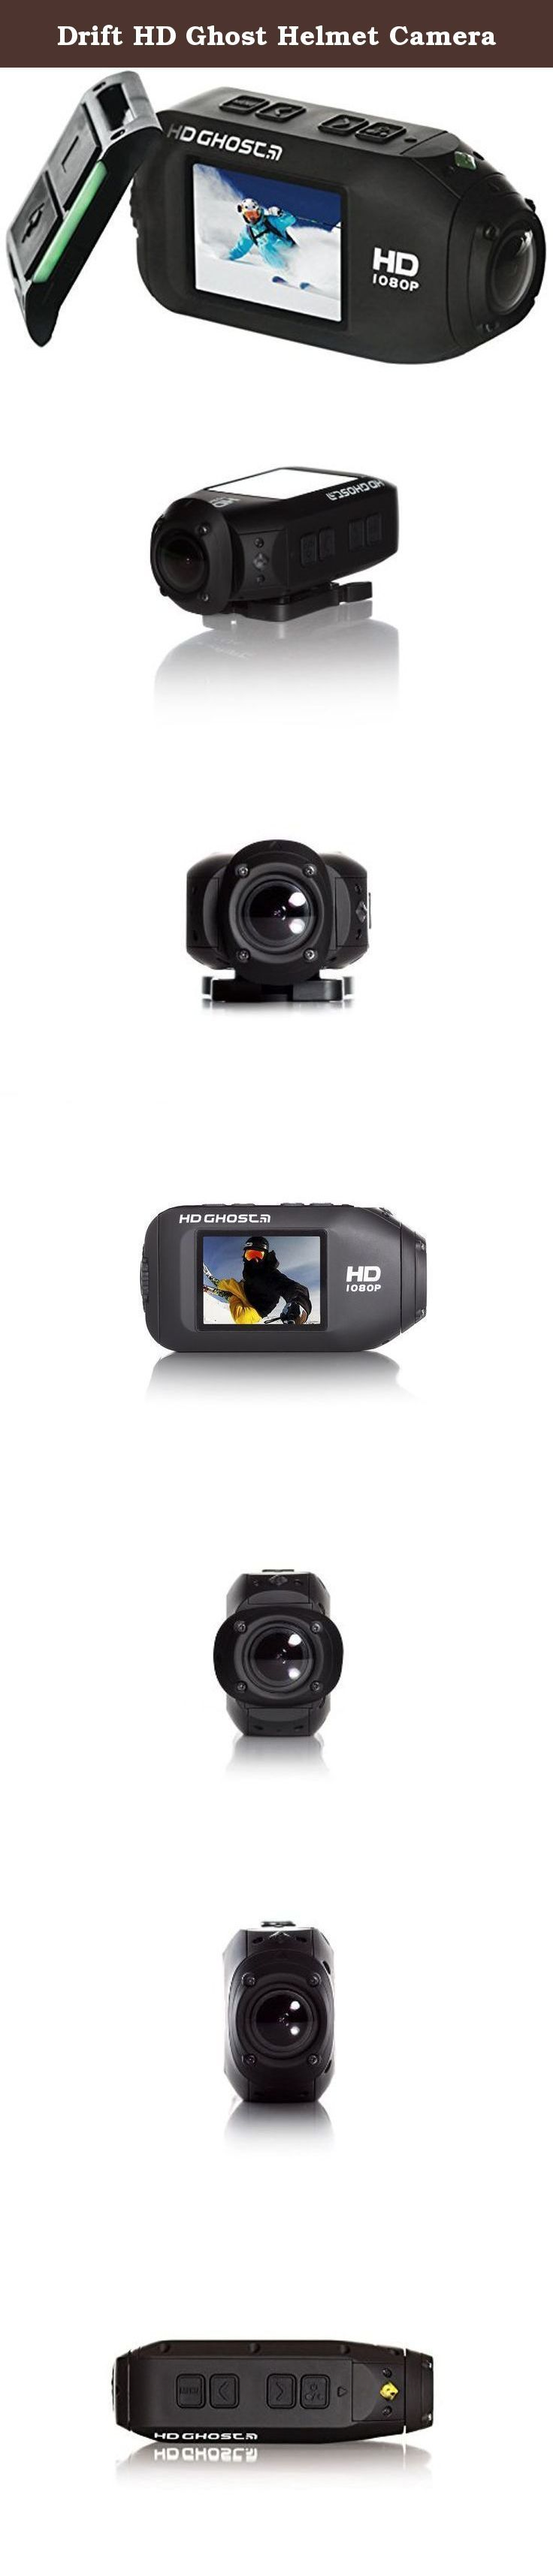 Drift HD Ghost Helmet Camera. Drift Innovation, the award